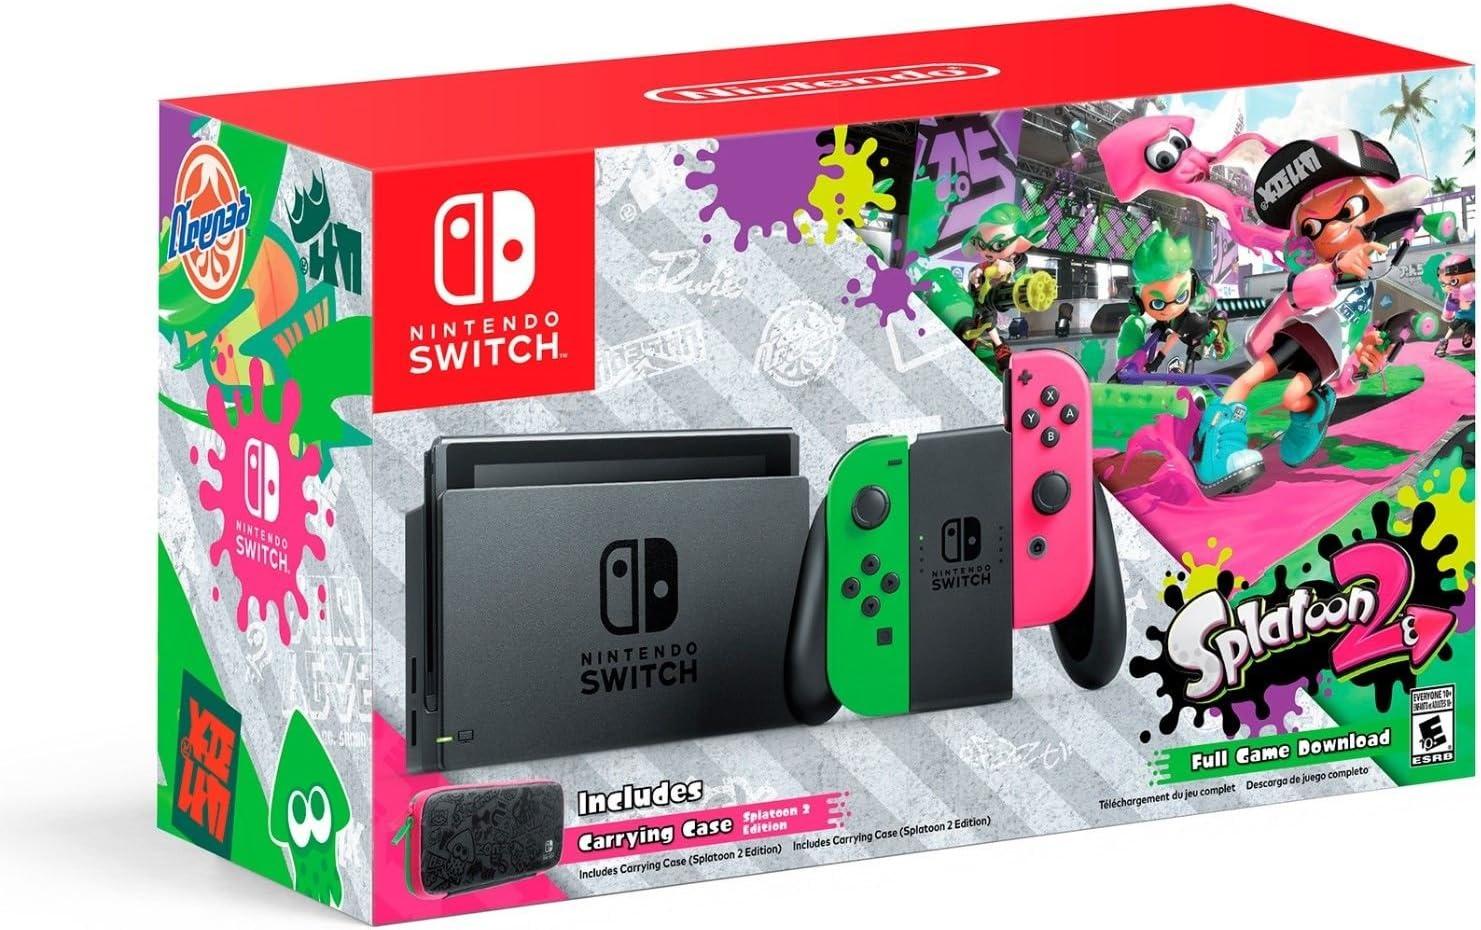 Promotion nintendo switch pack cdiscount, avis nintendo switch jeux mario